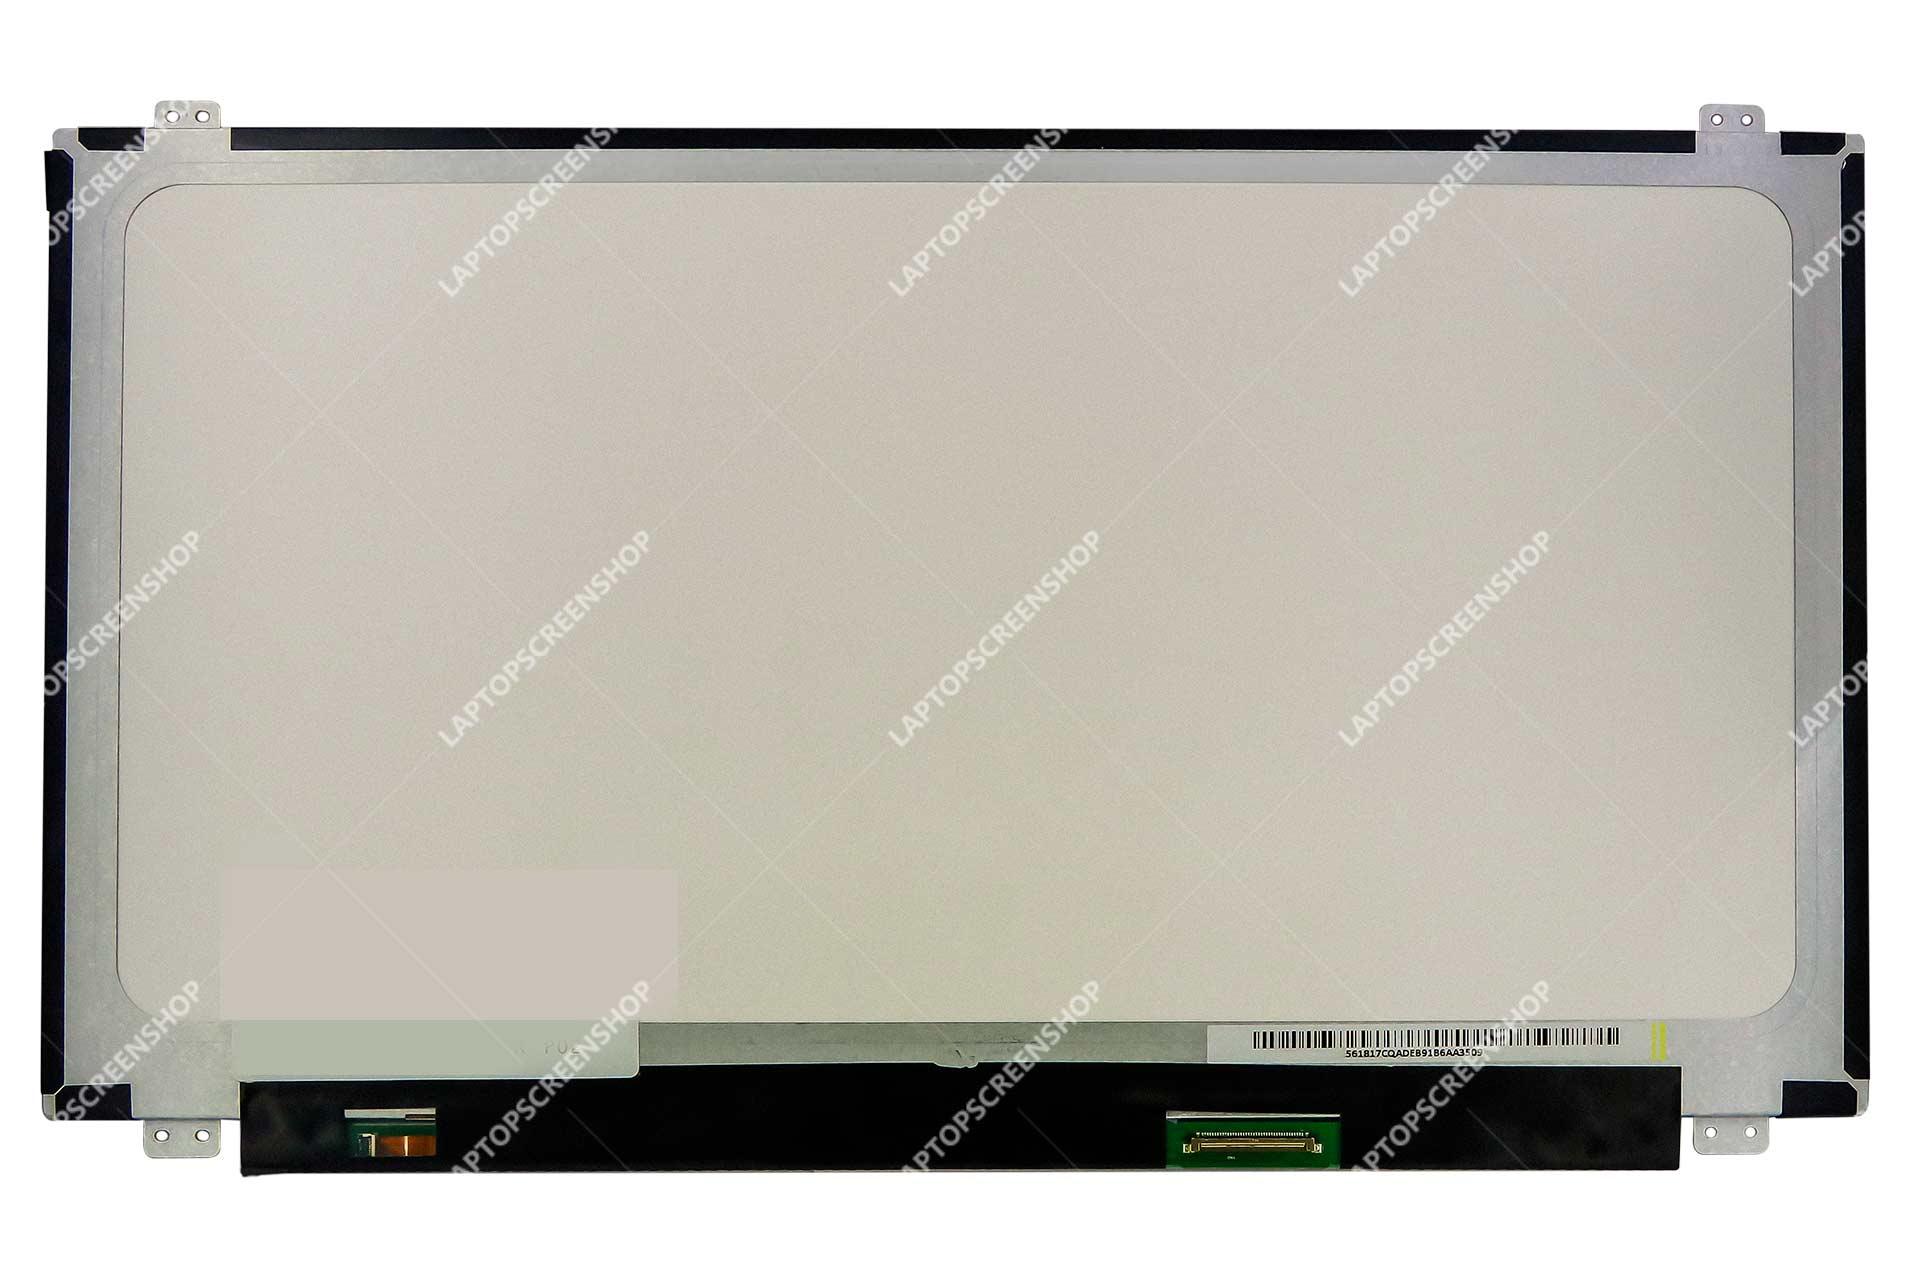 SONY-VAIO-SVS15117FLB-LCD |FHD|فروشگاه لپ تاپ اسکرين | تعمير لپ تاپ